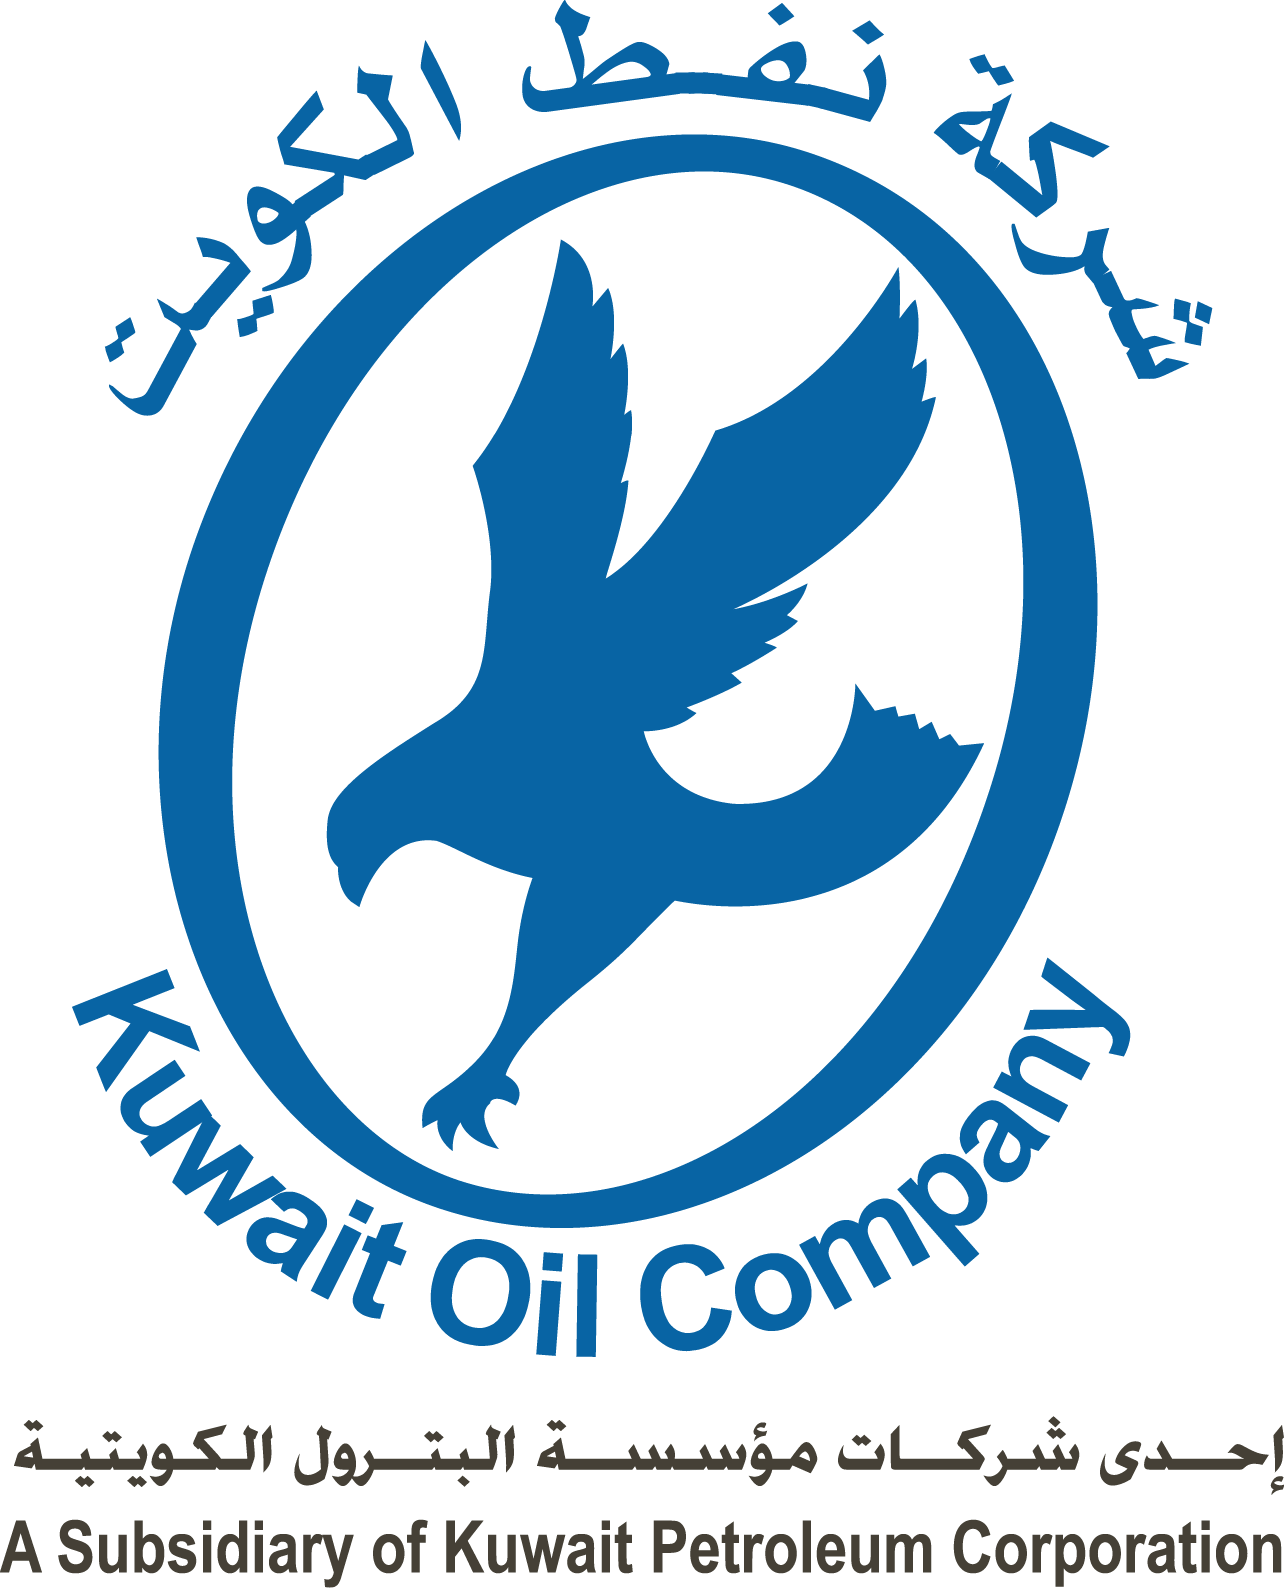 KOC_Logo_for_wikipedia